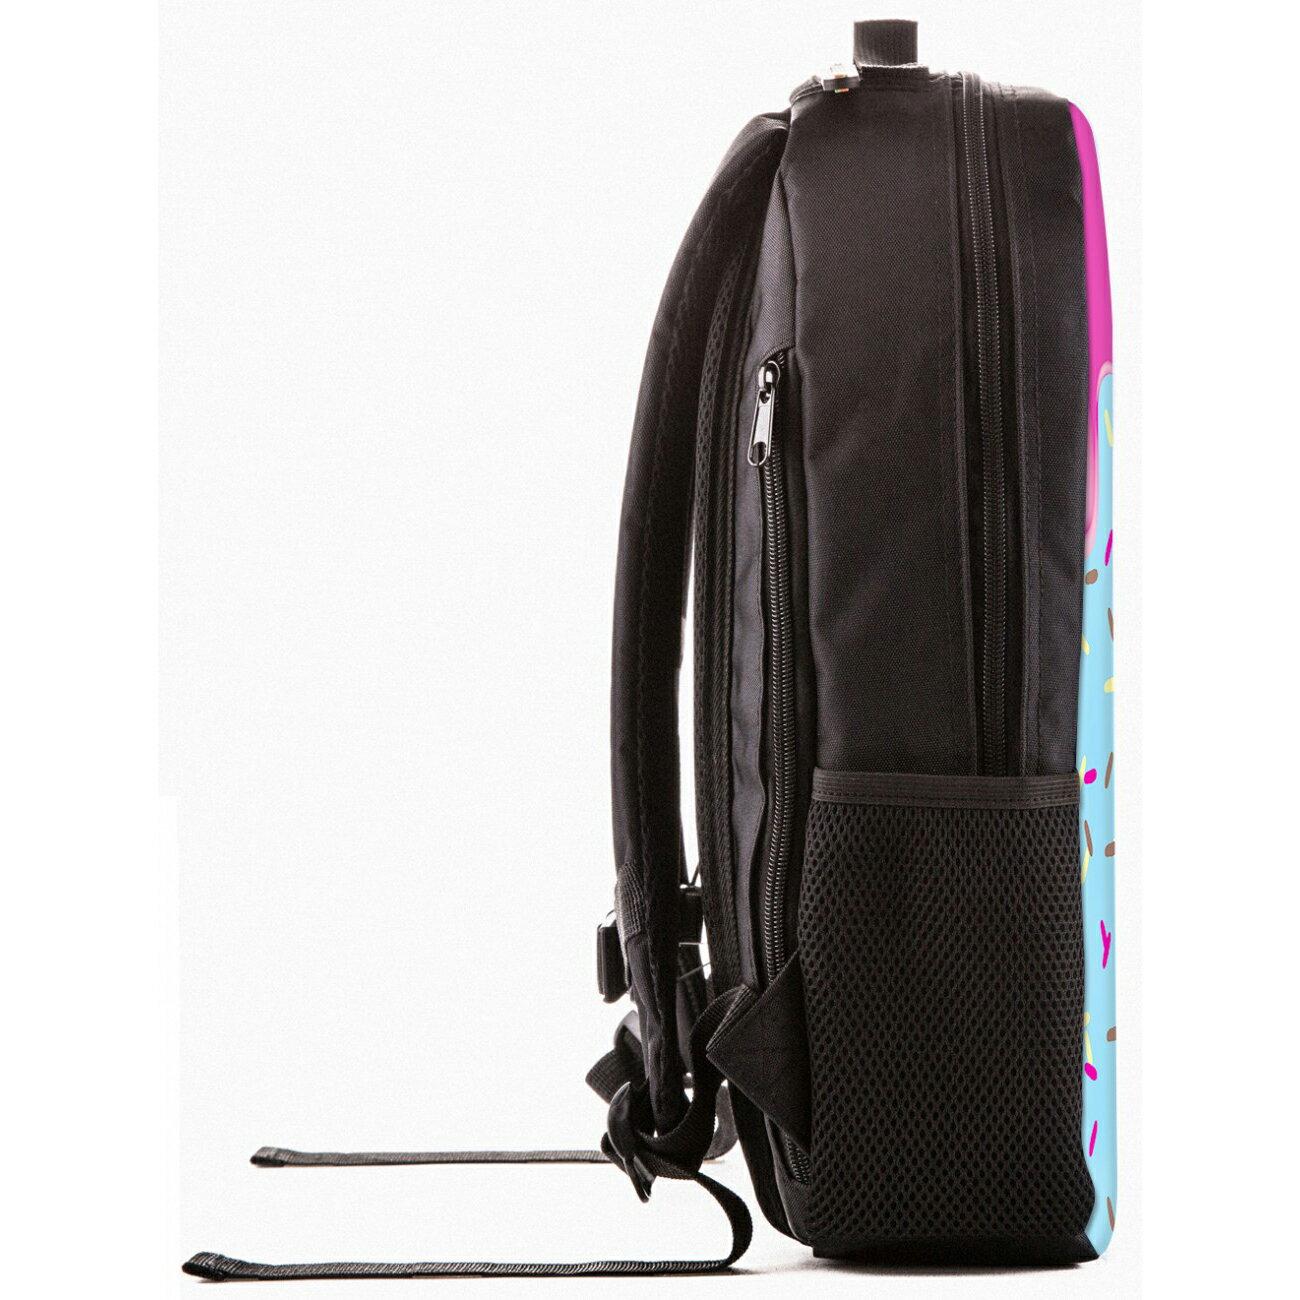 Urban Junk 'Hello Schweety' Girls Backpack 1